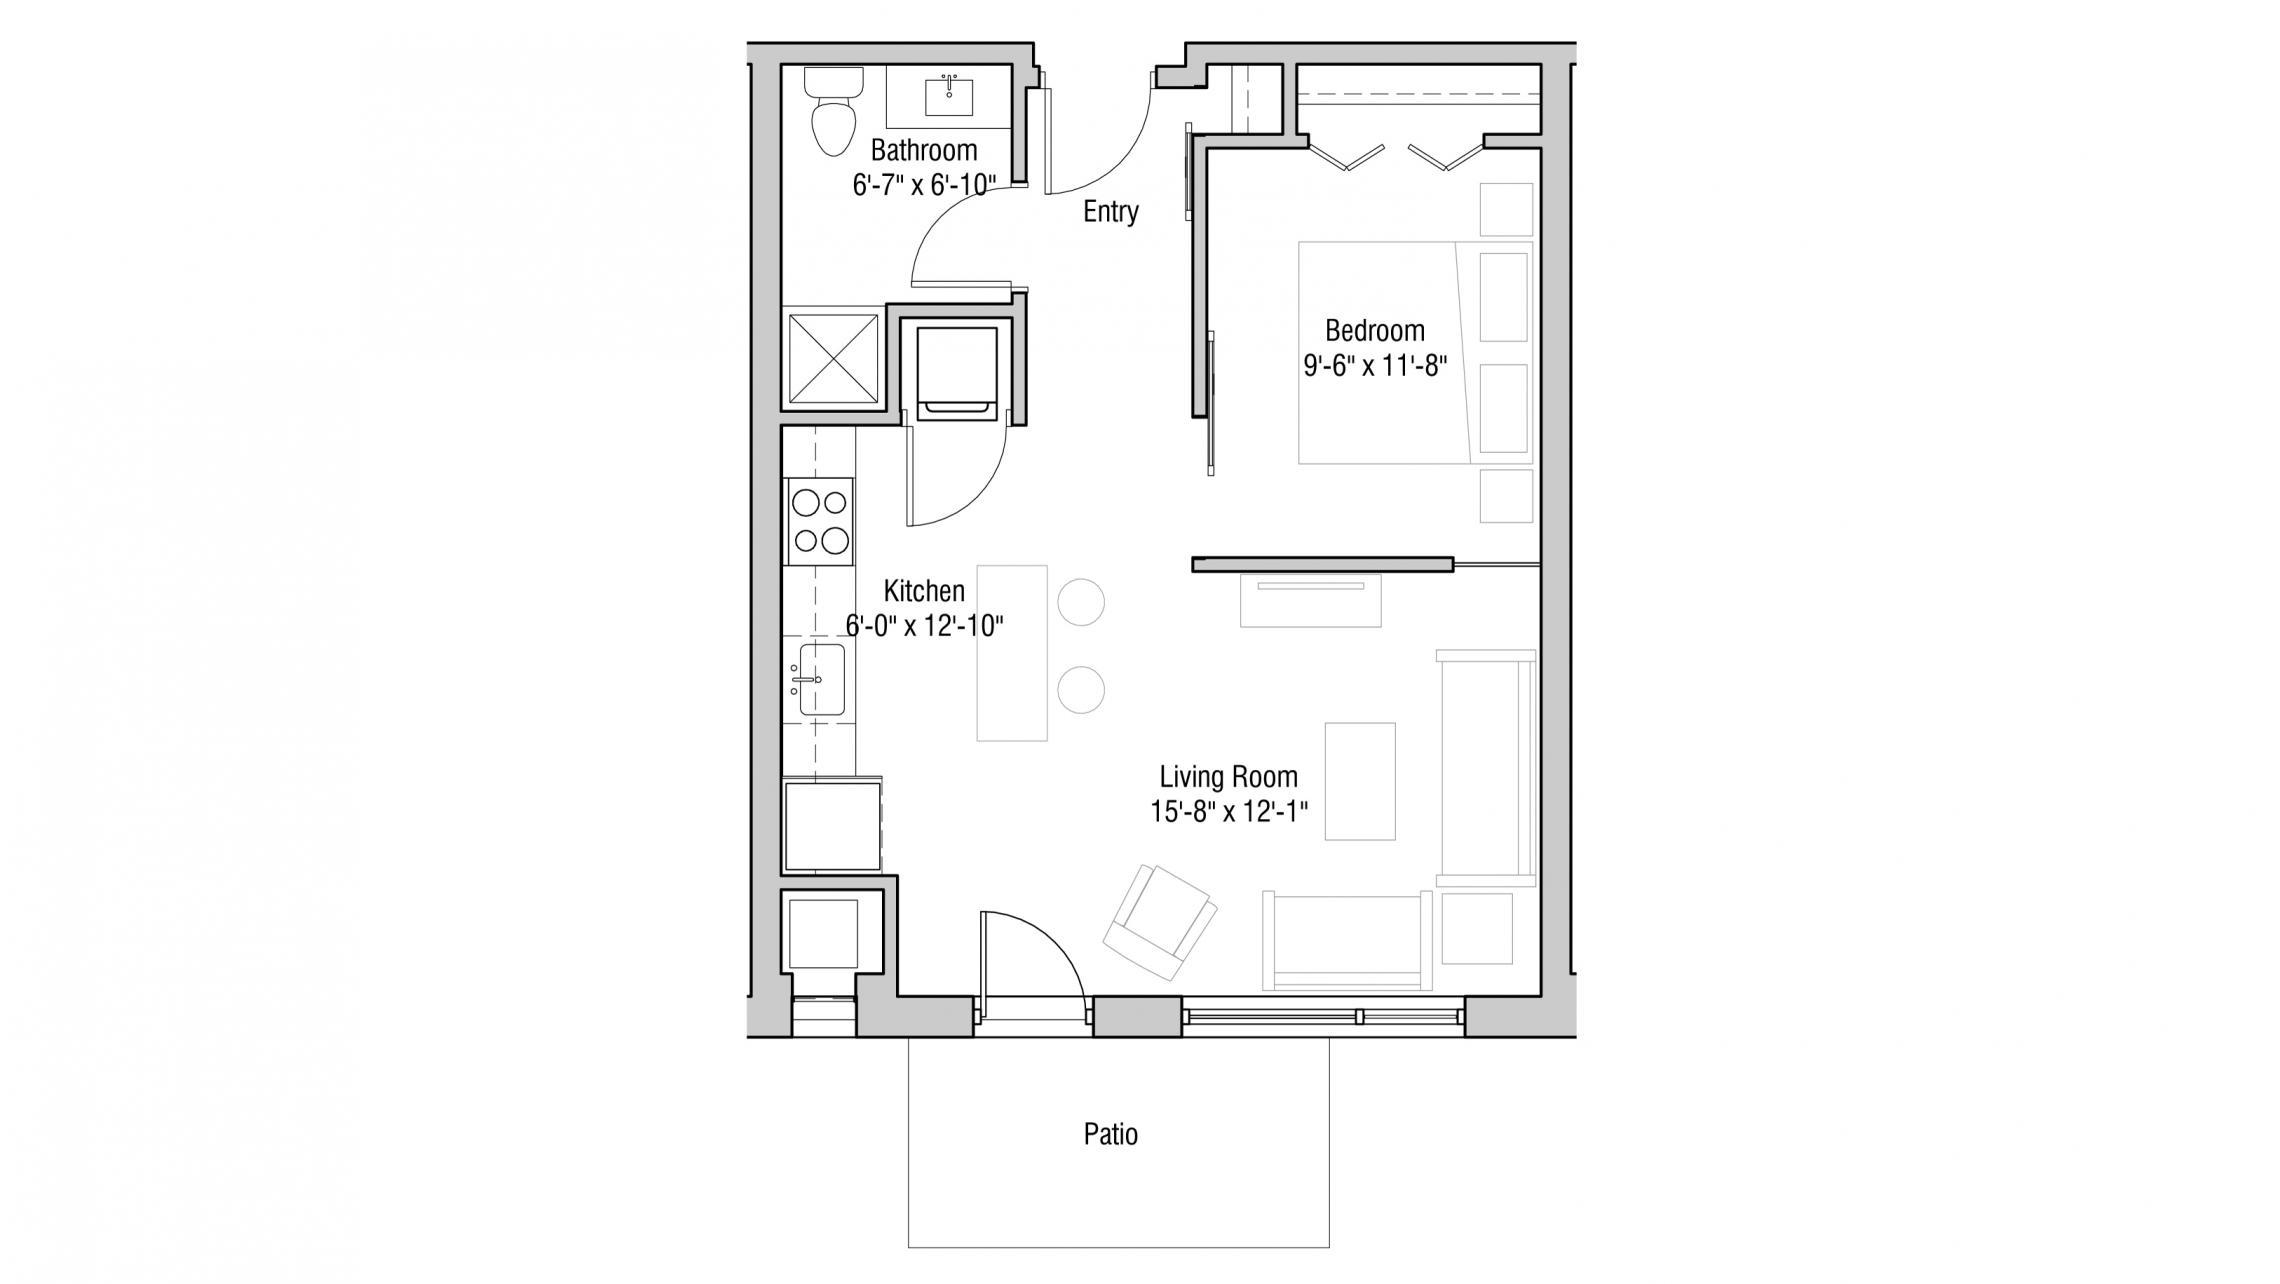 ULI Quarter Row 104 - One Bedroom, One Bathroom